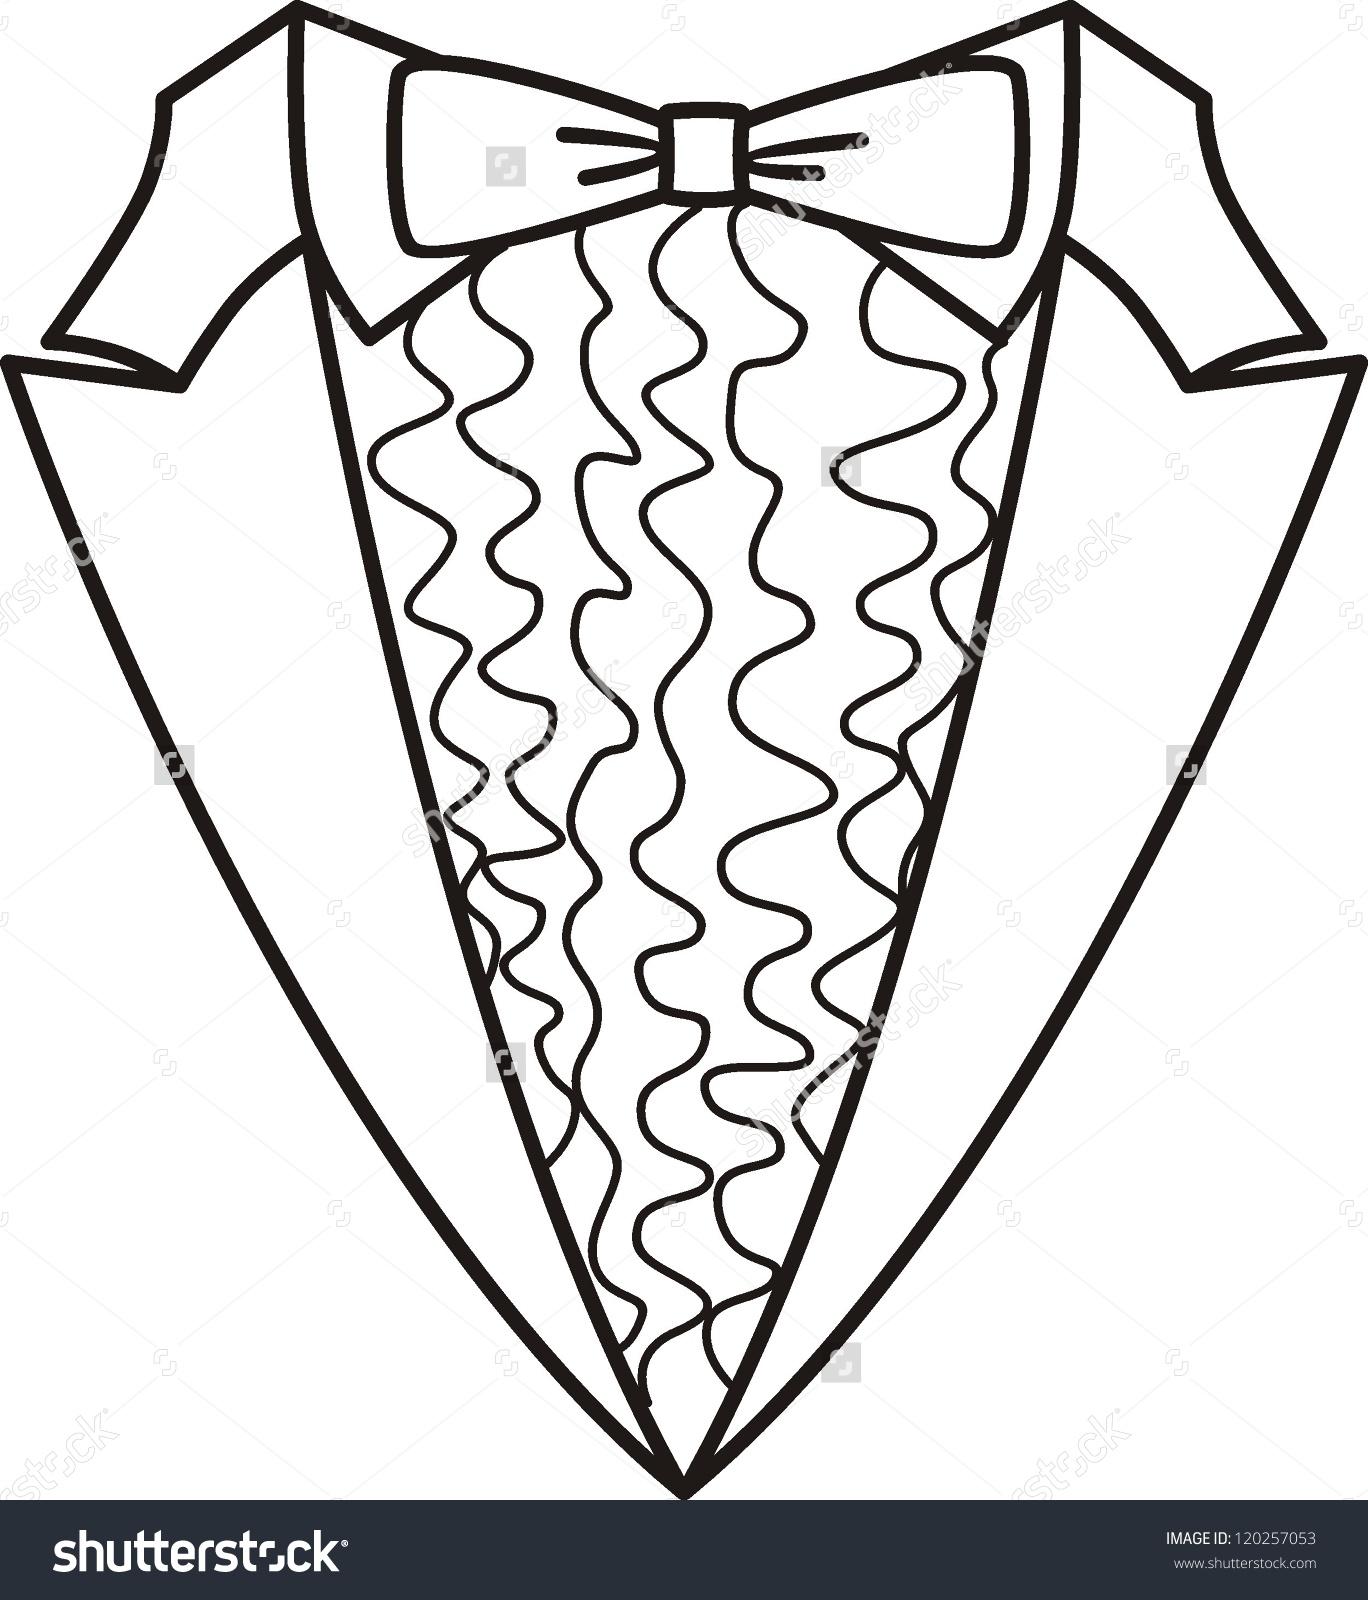 Tuxedo coloring #7, Download drawings